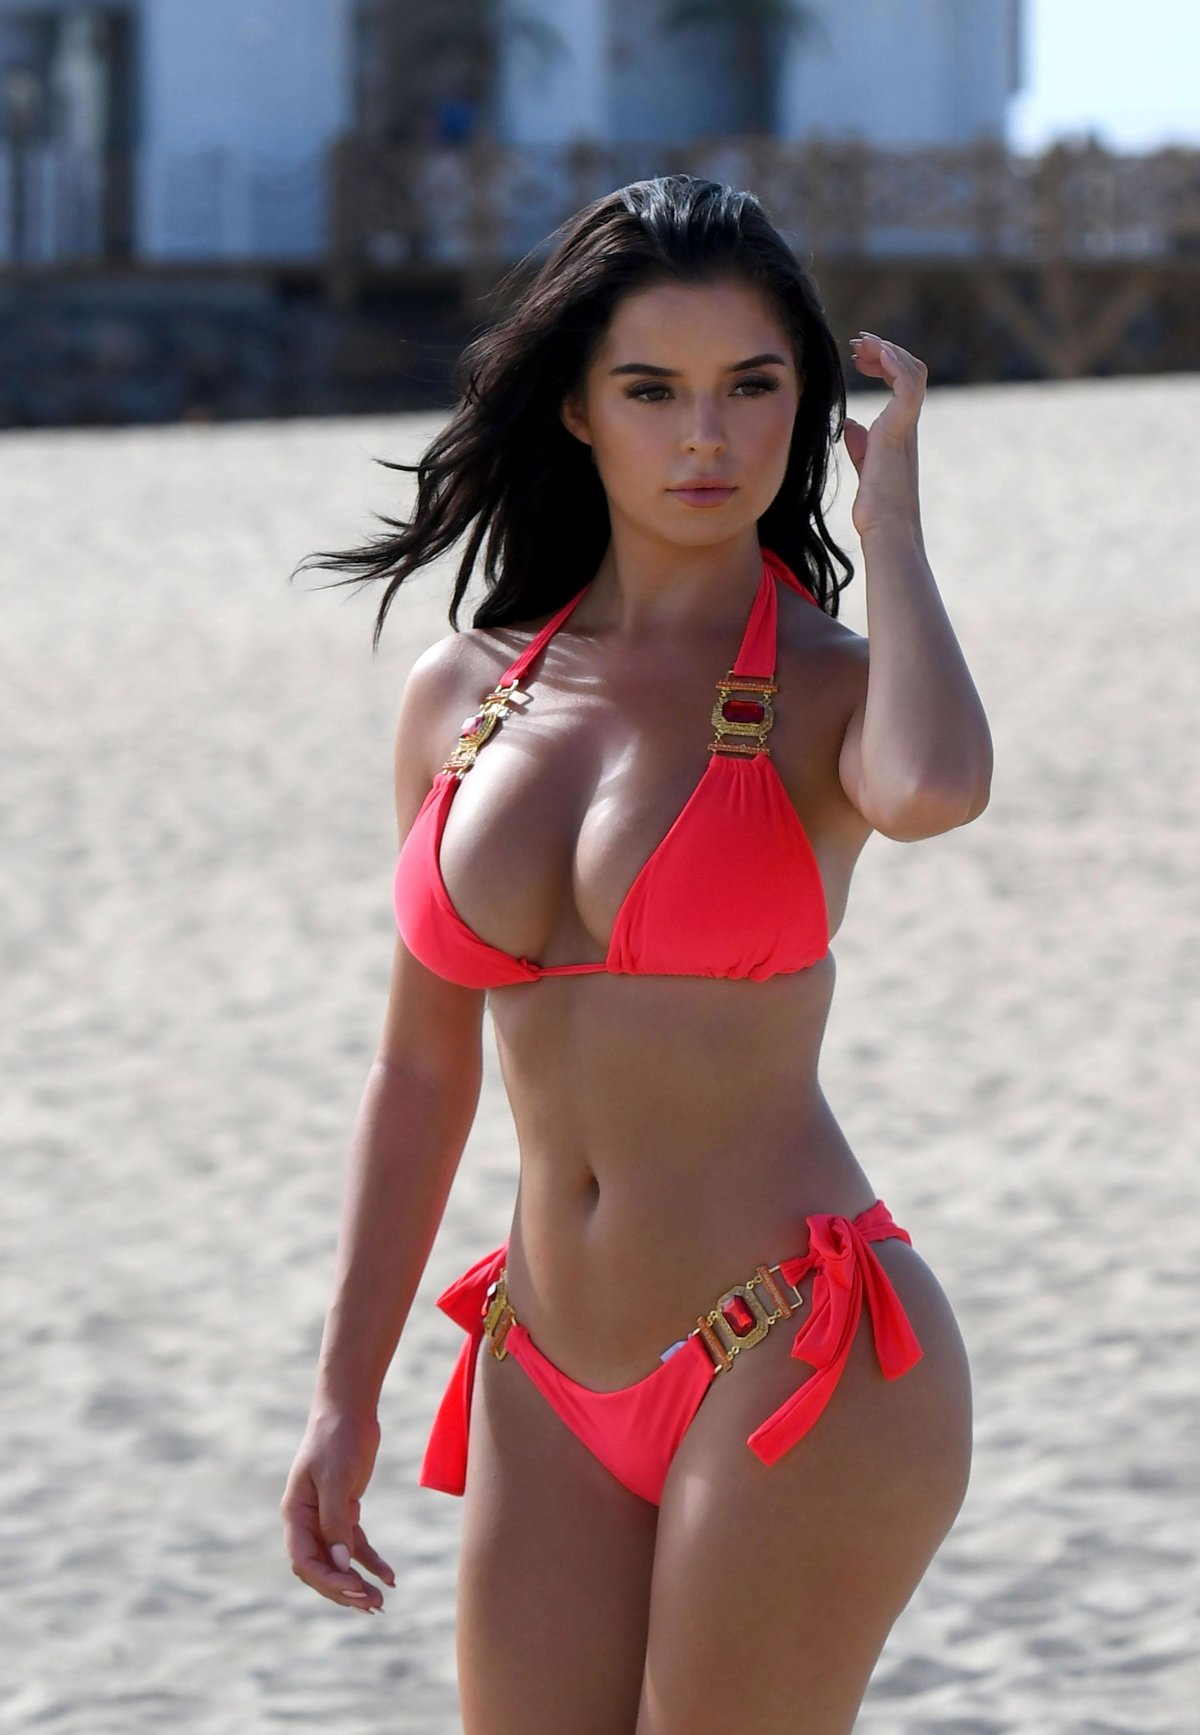 латинки бикини модели на пляжах фото - 4